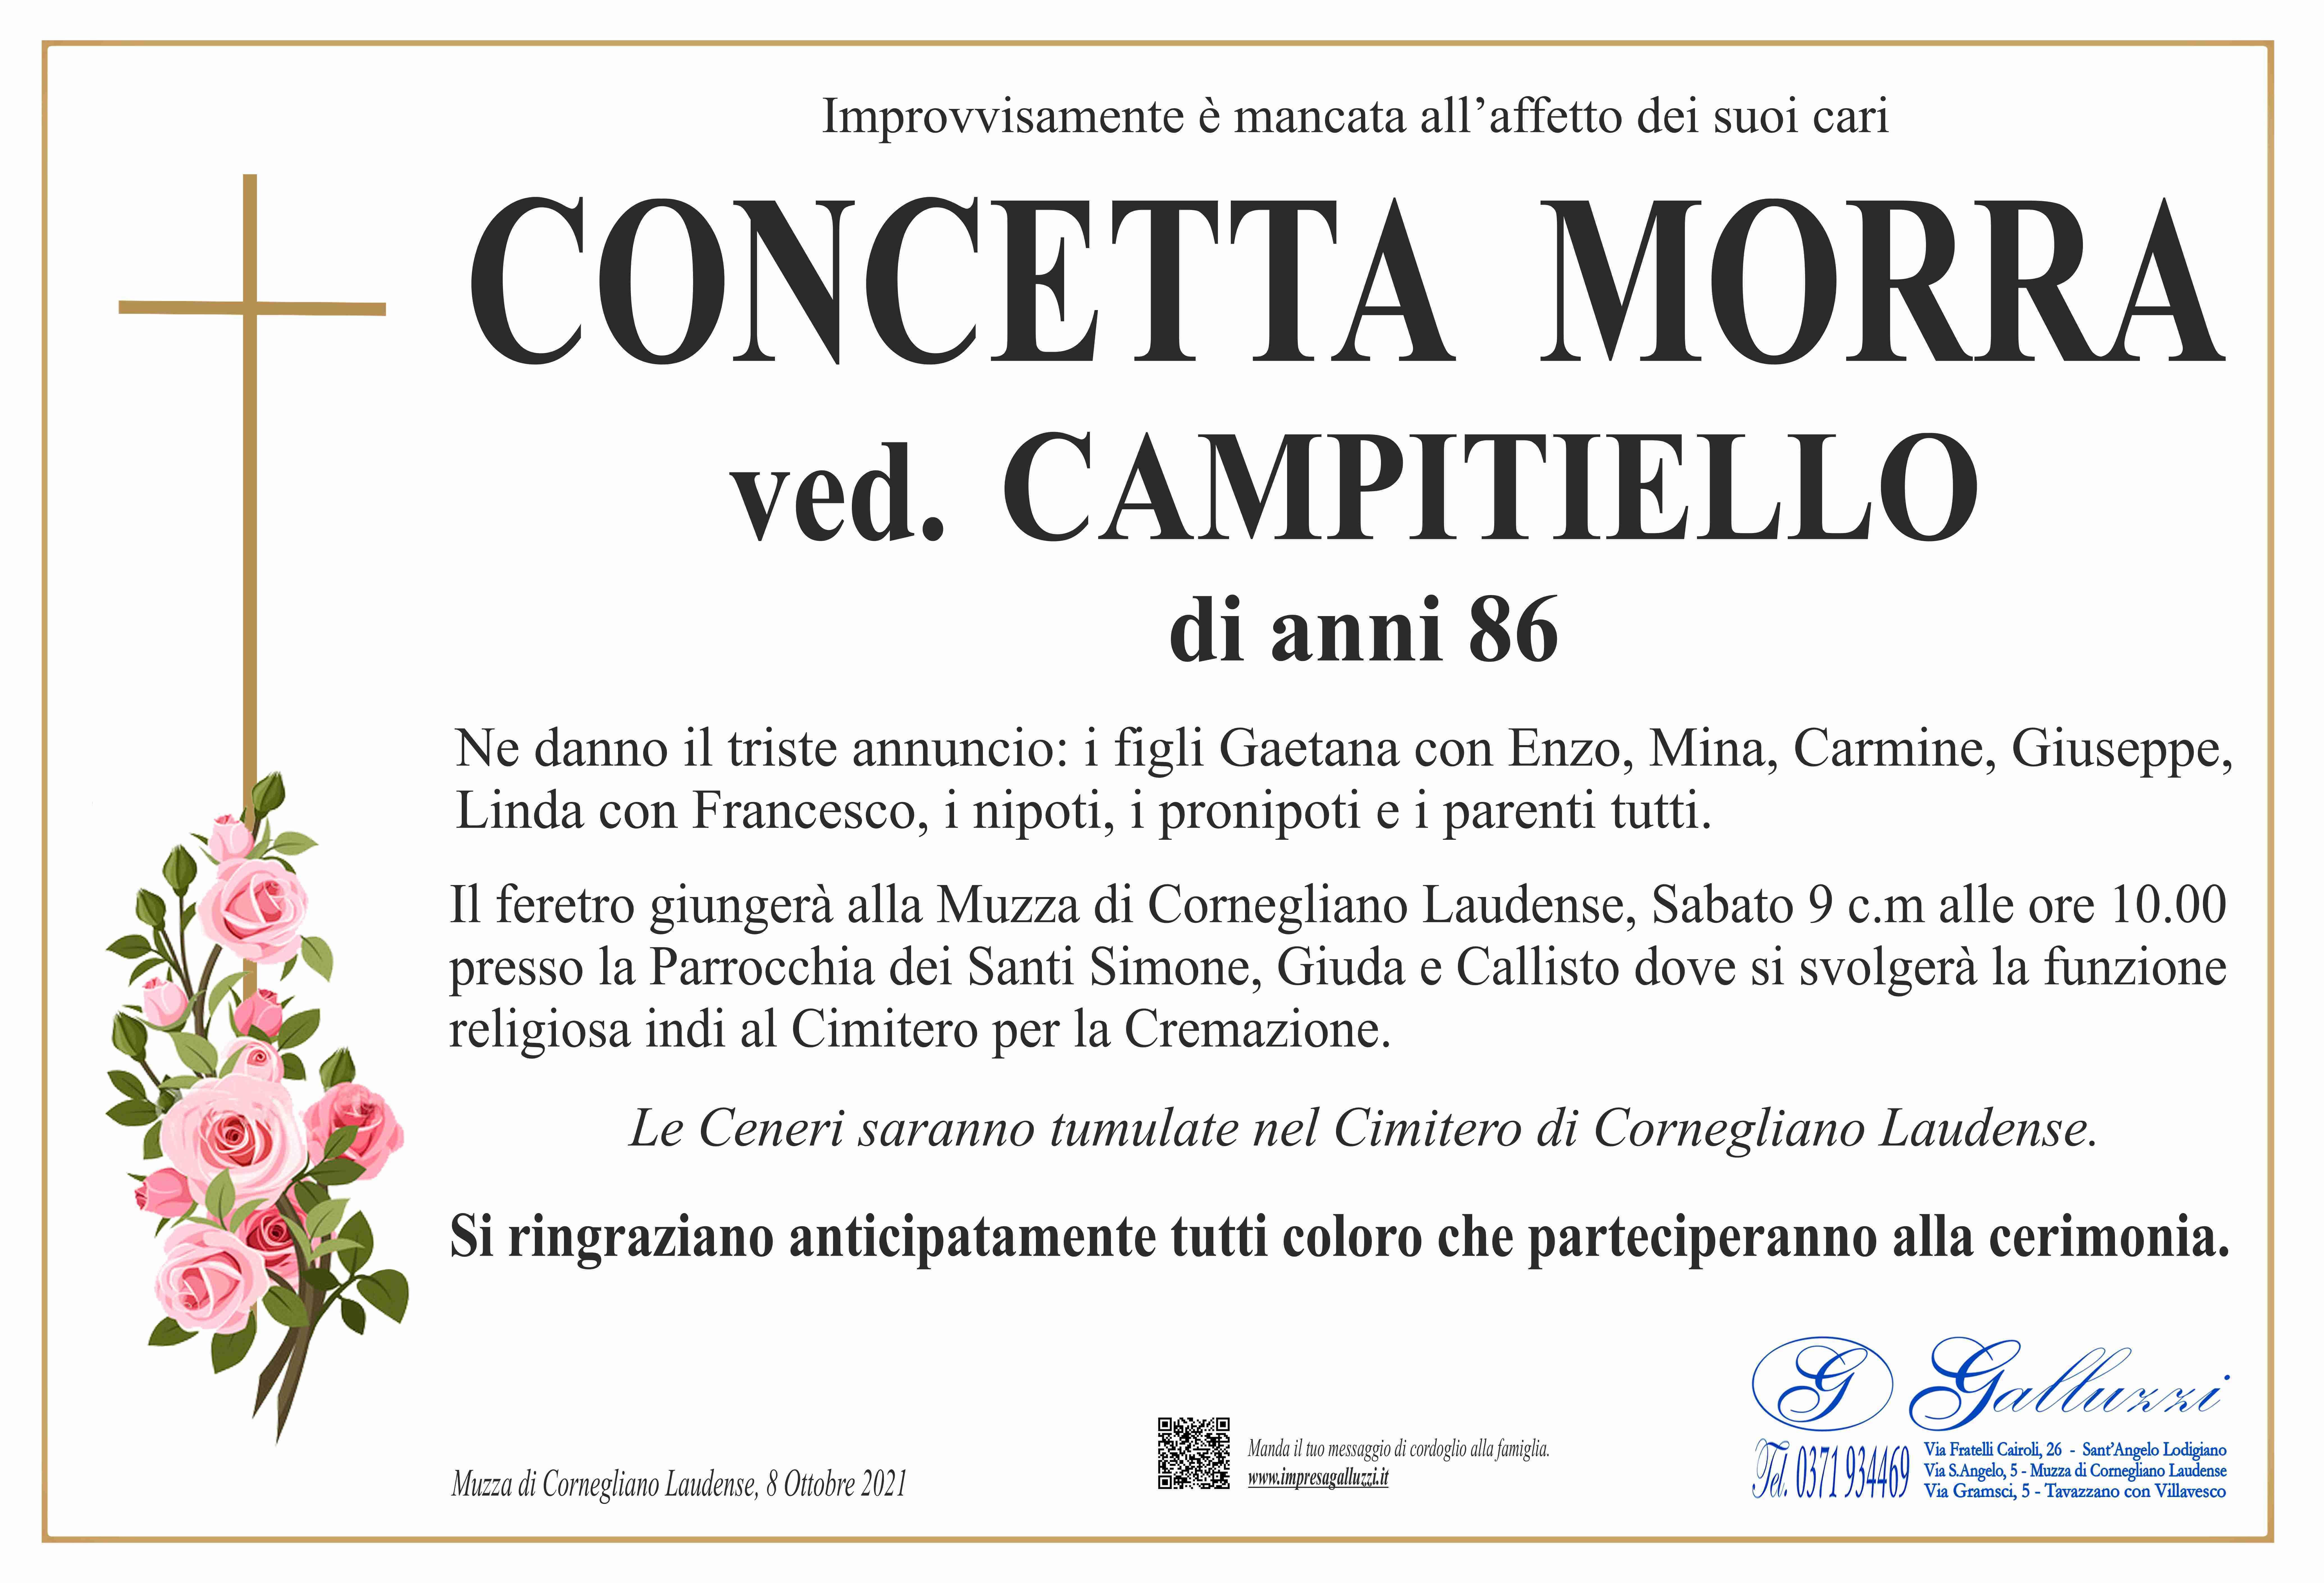 Concetta Morra